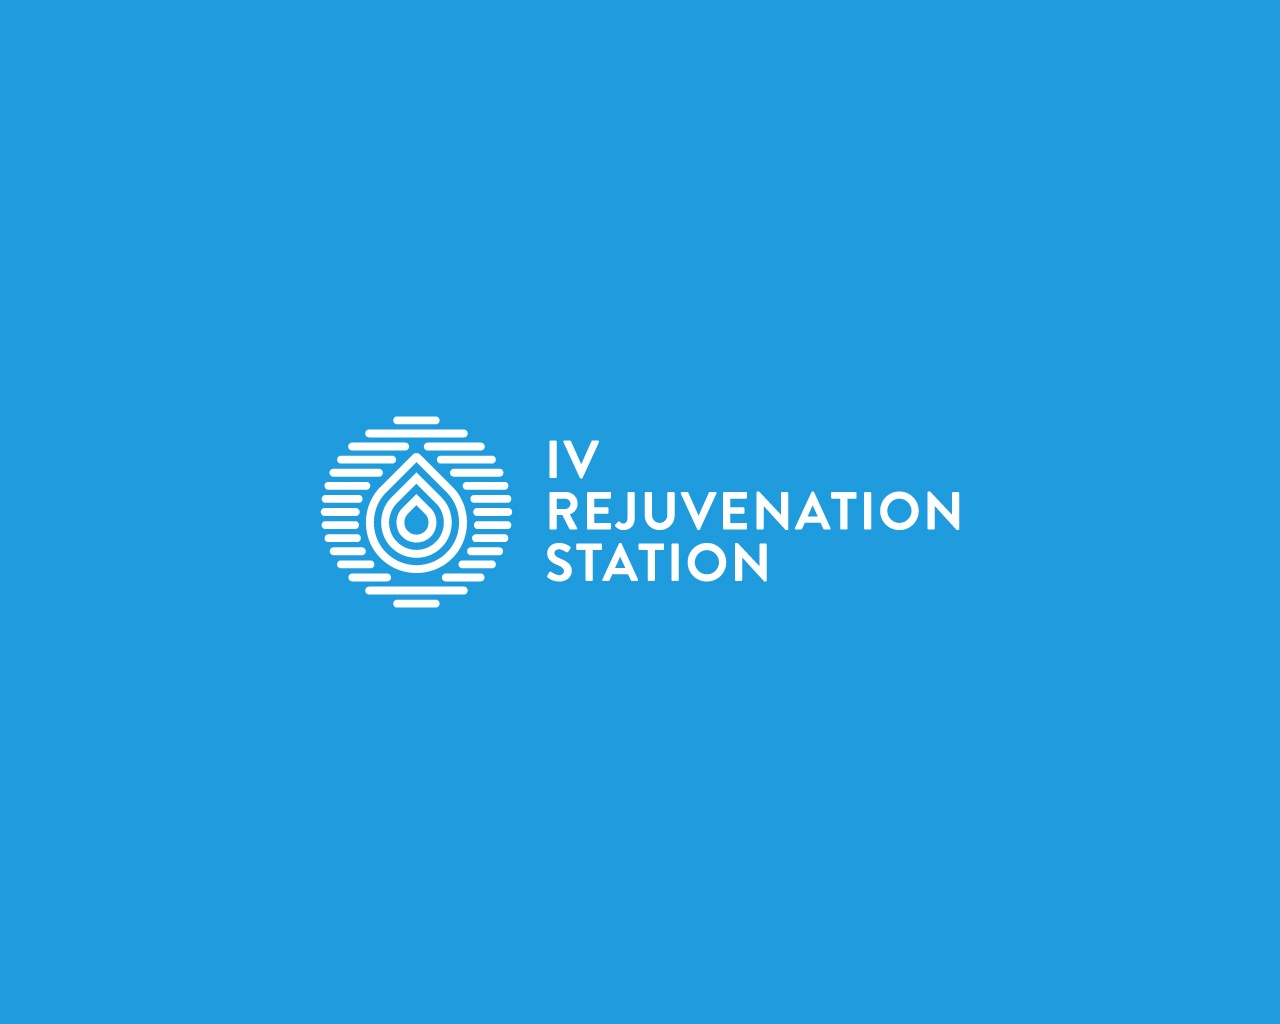 IV Rejuvenation Station Logo